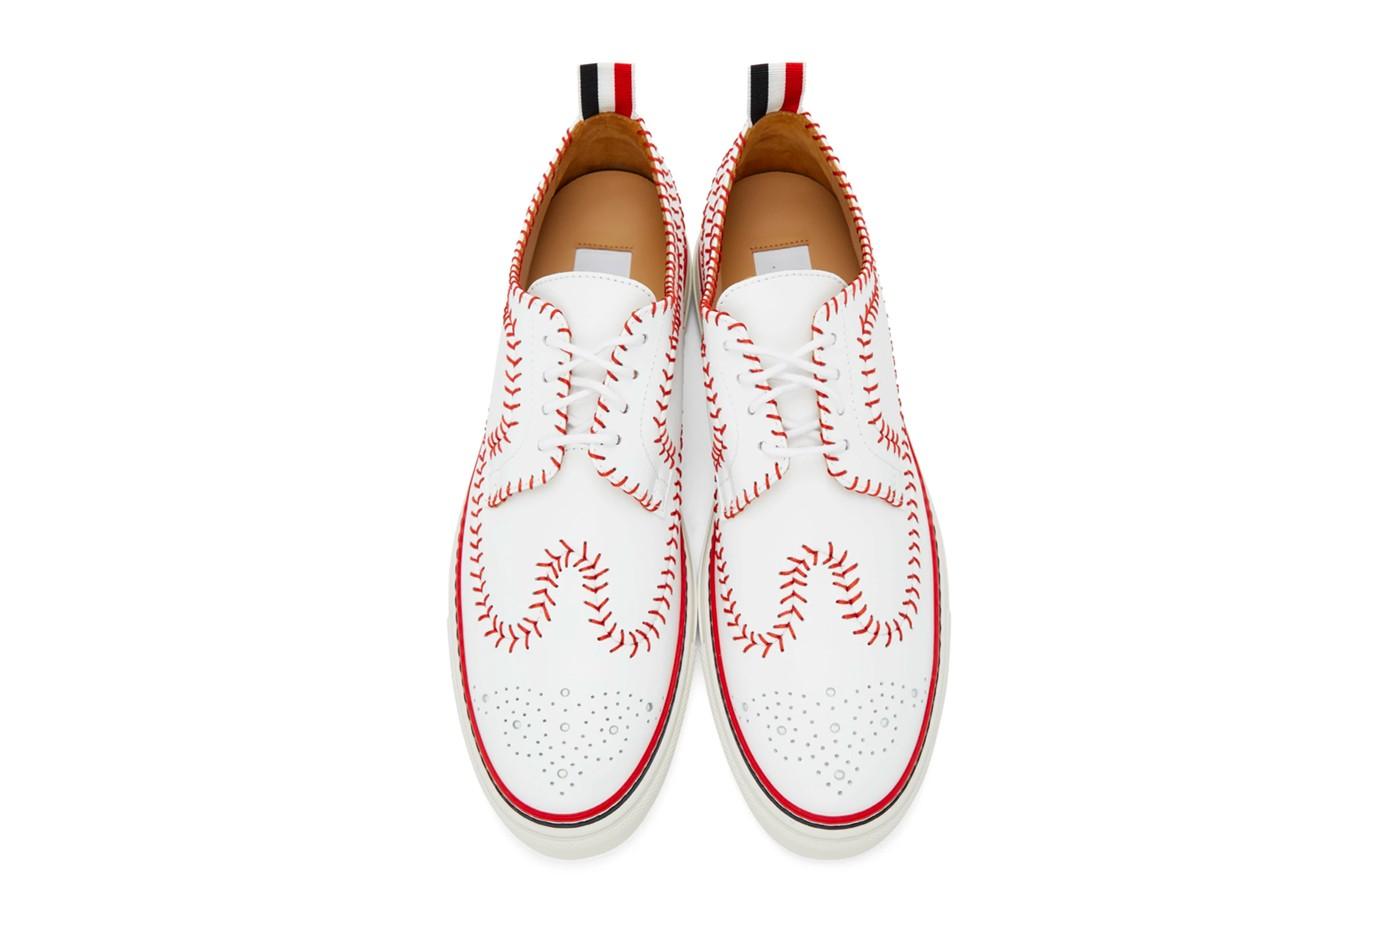 Thom Browne baseball inspired sneakers